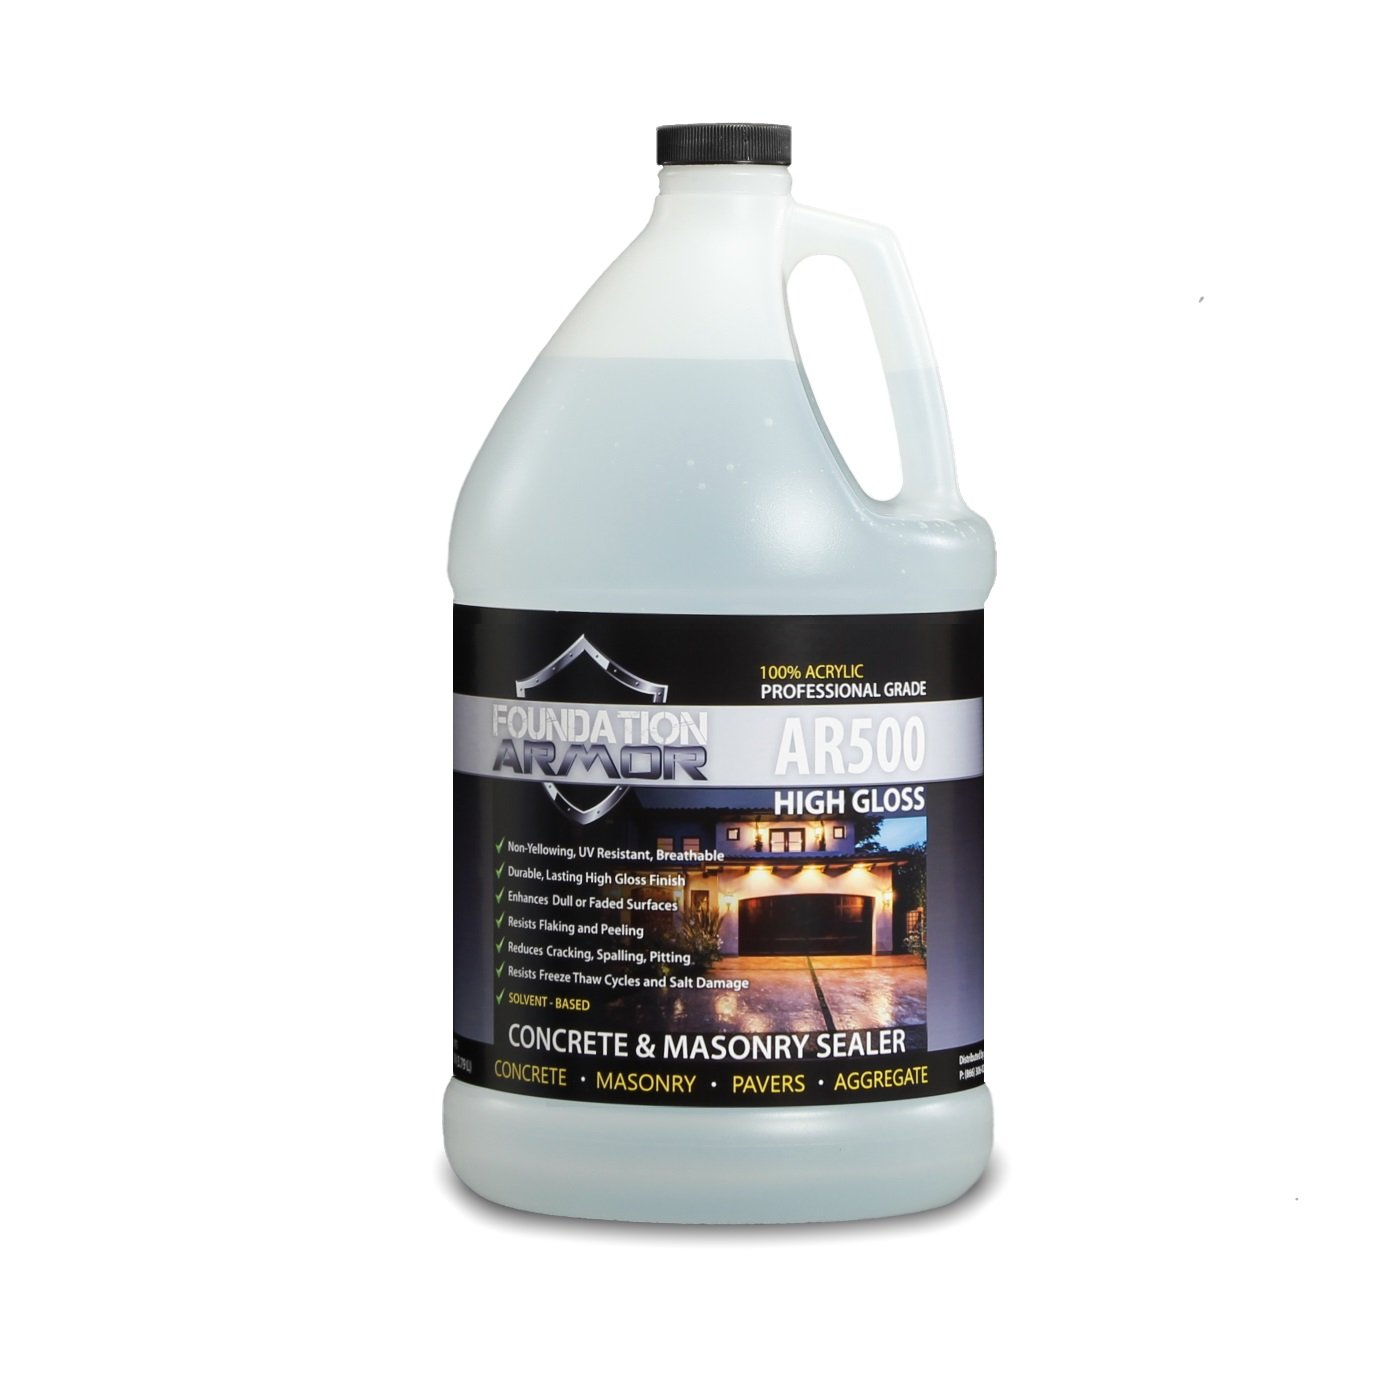 Armor AR500 Solvent Based High Gloss Acrylic Concrete Driveway Sealer